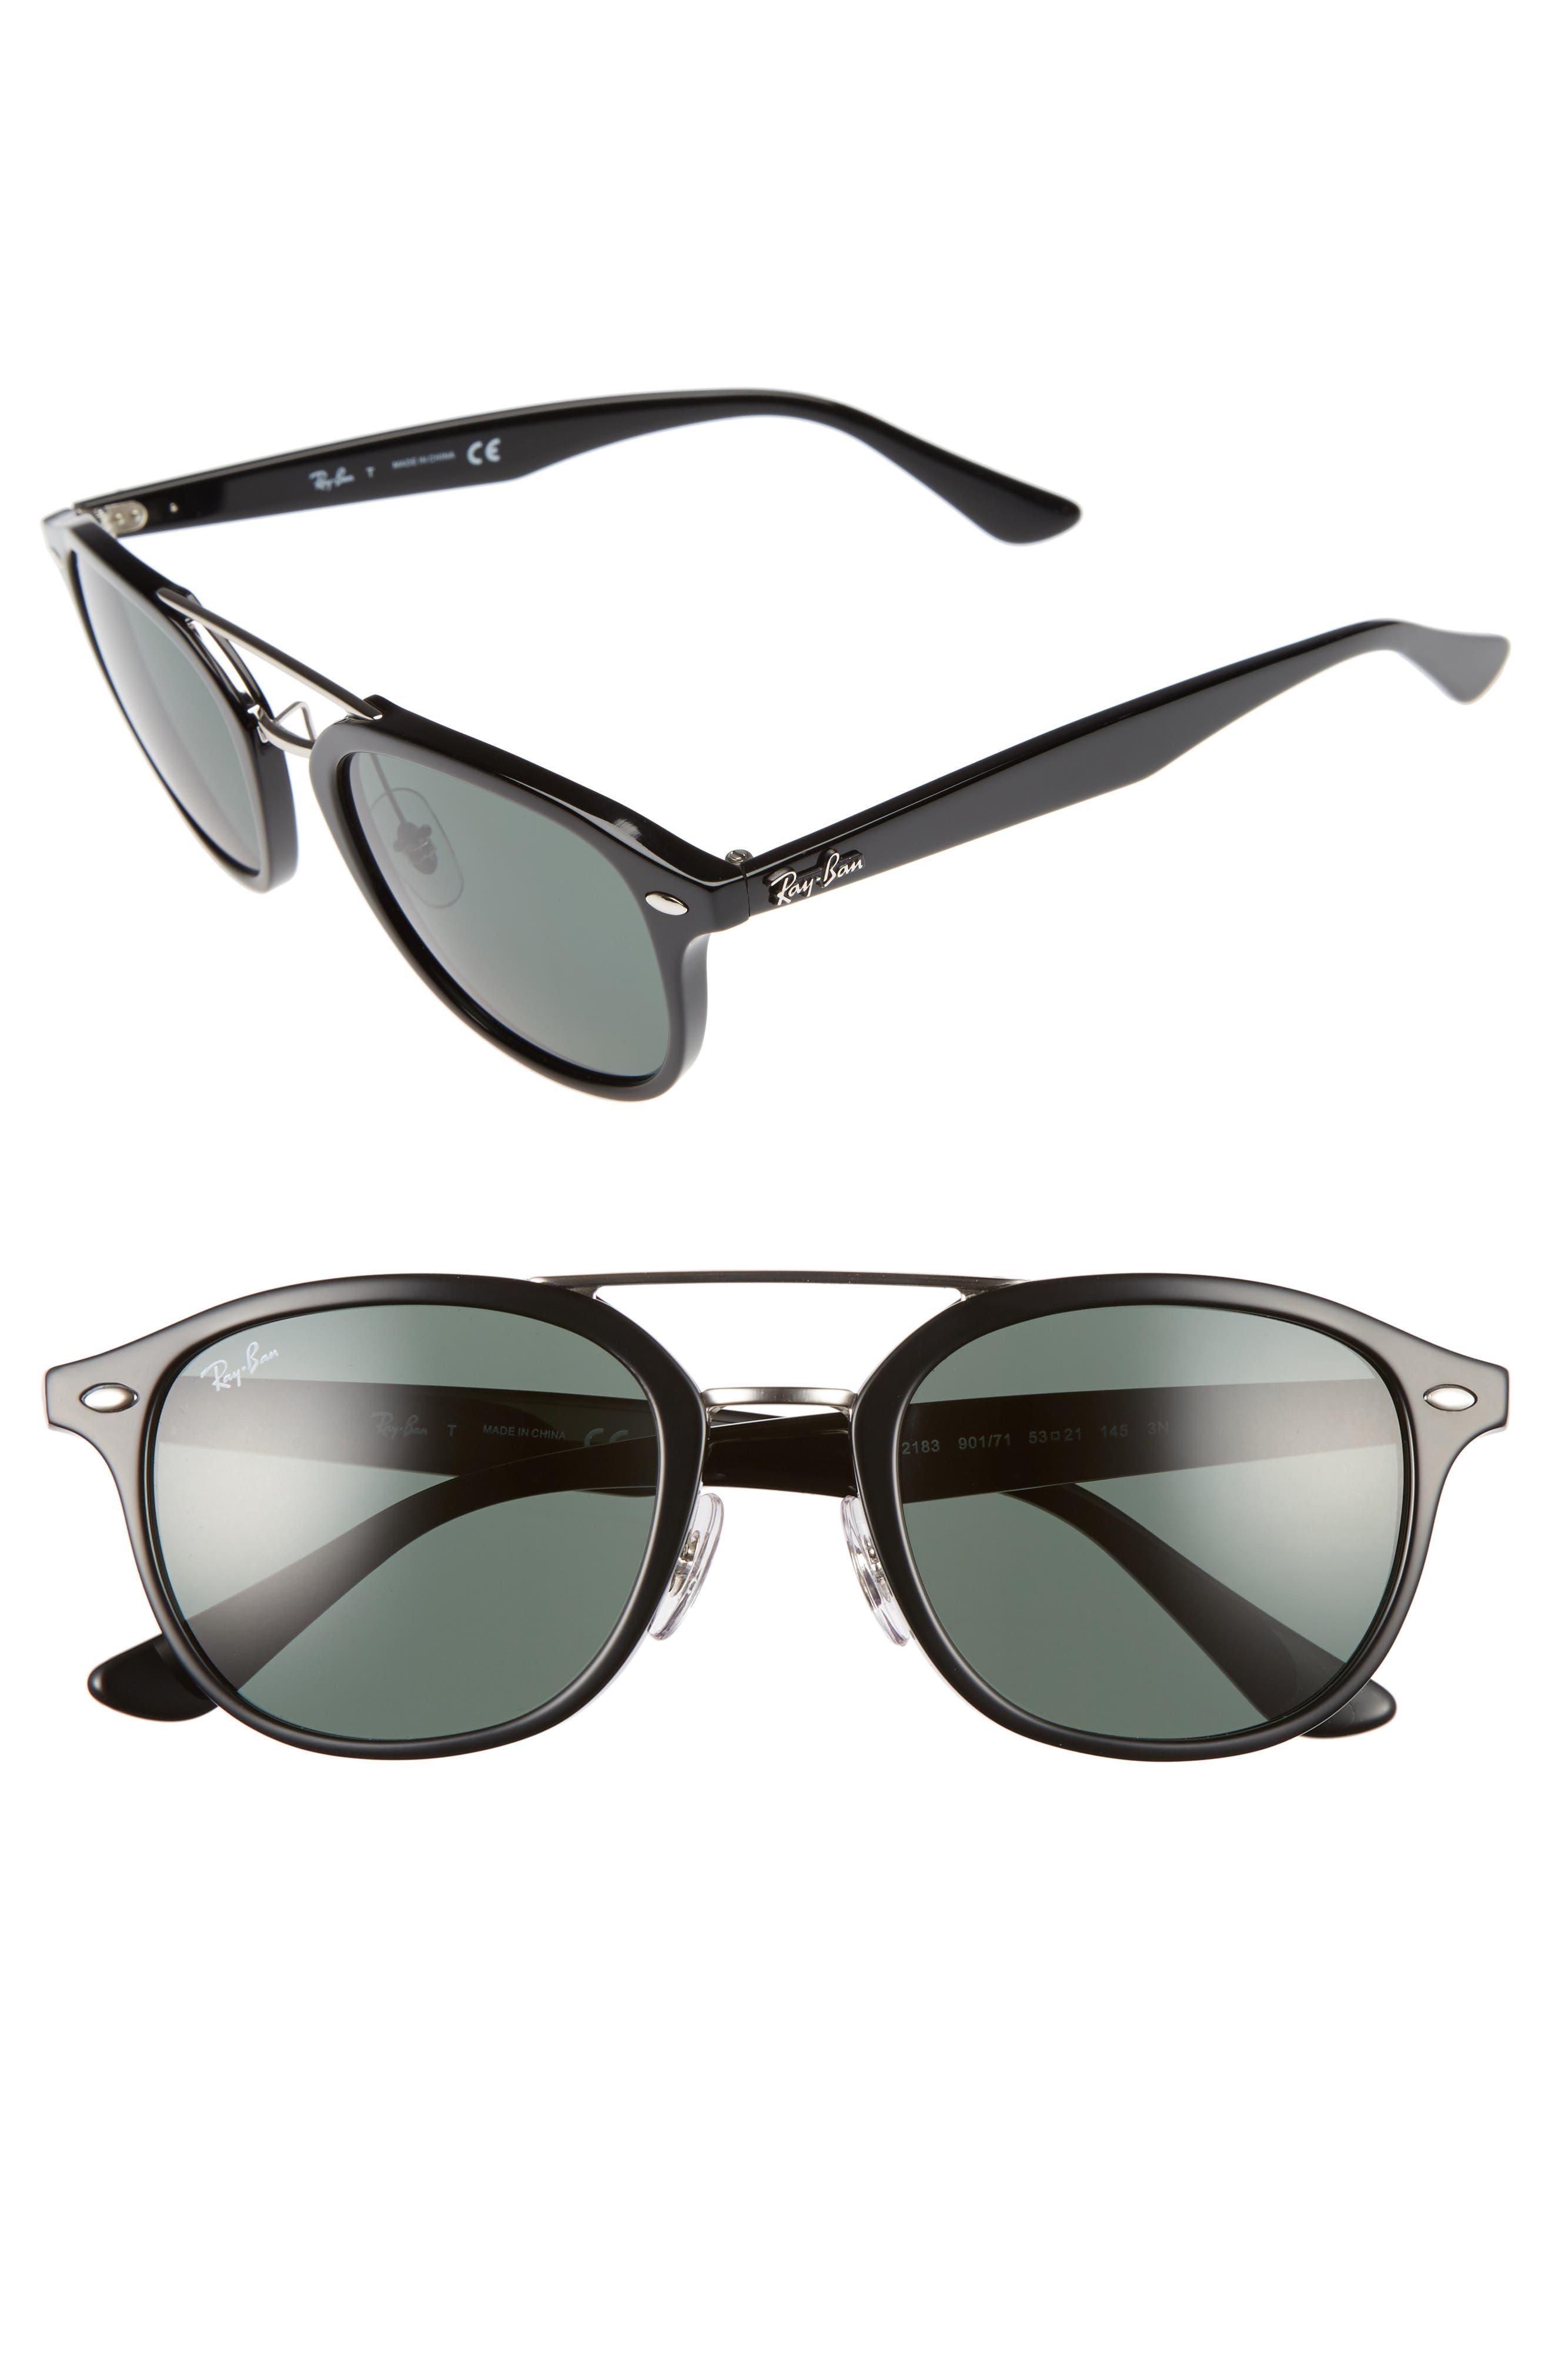 Highstreet 53mm Sunglasses,                         Main,                         color, Black/ Green